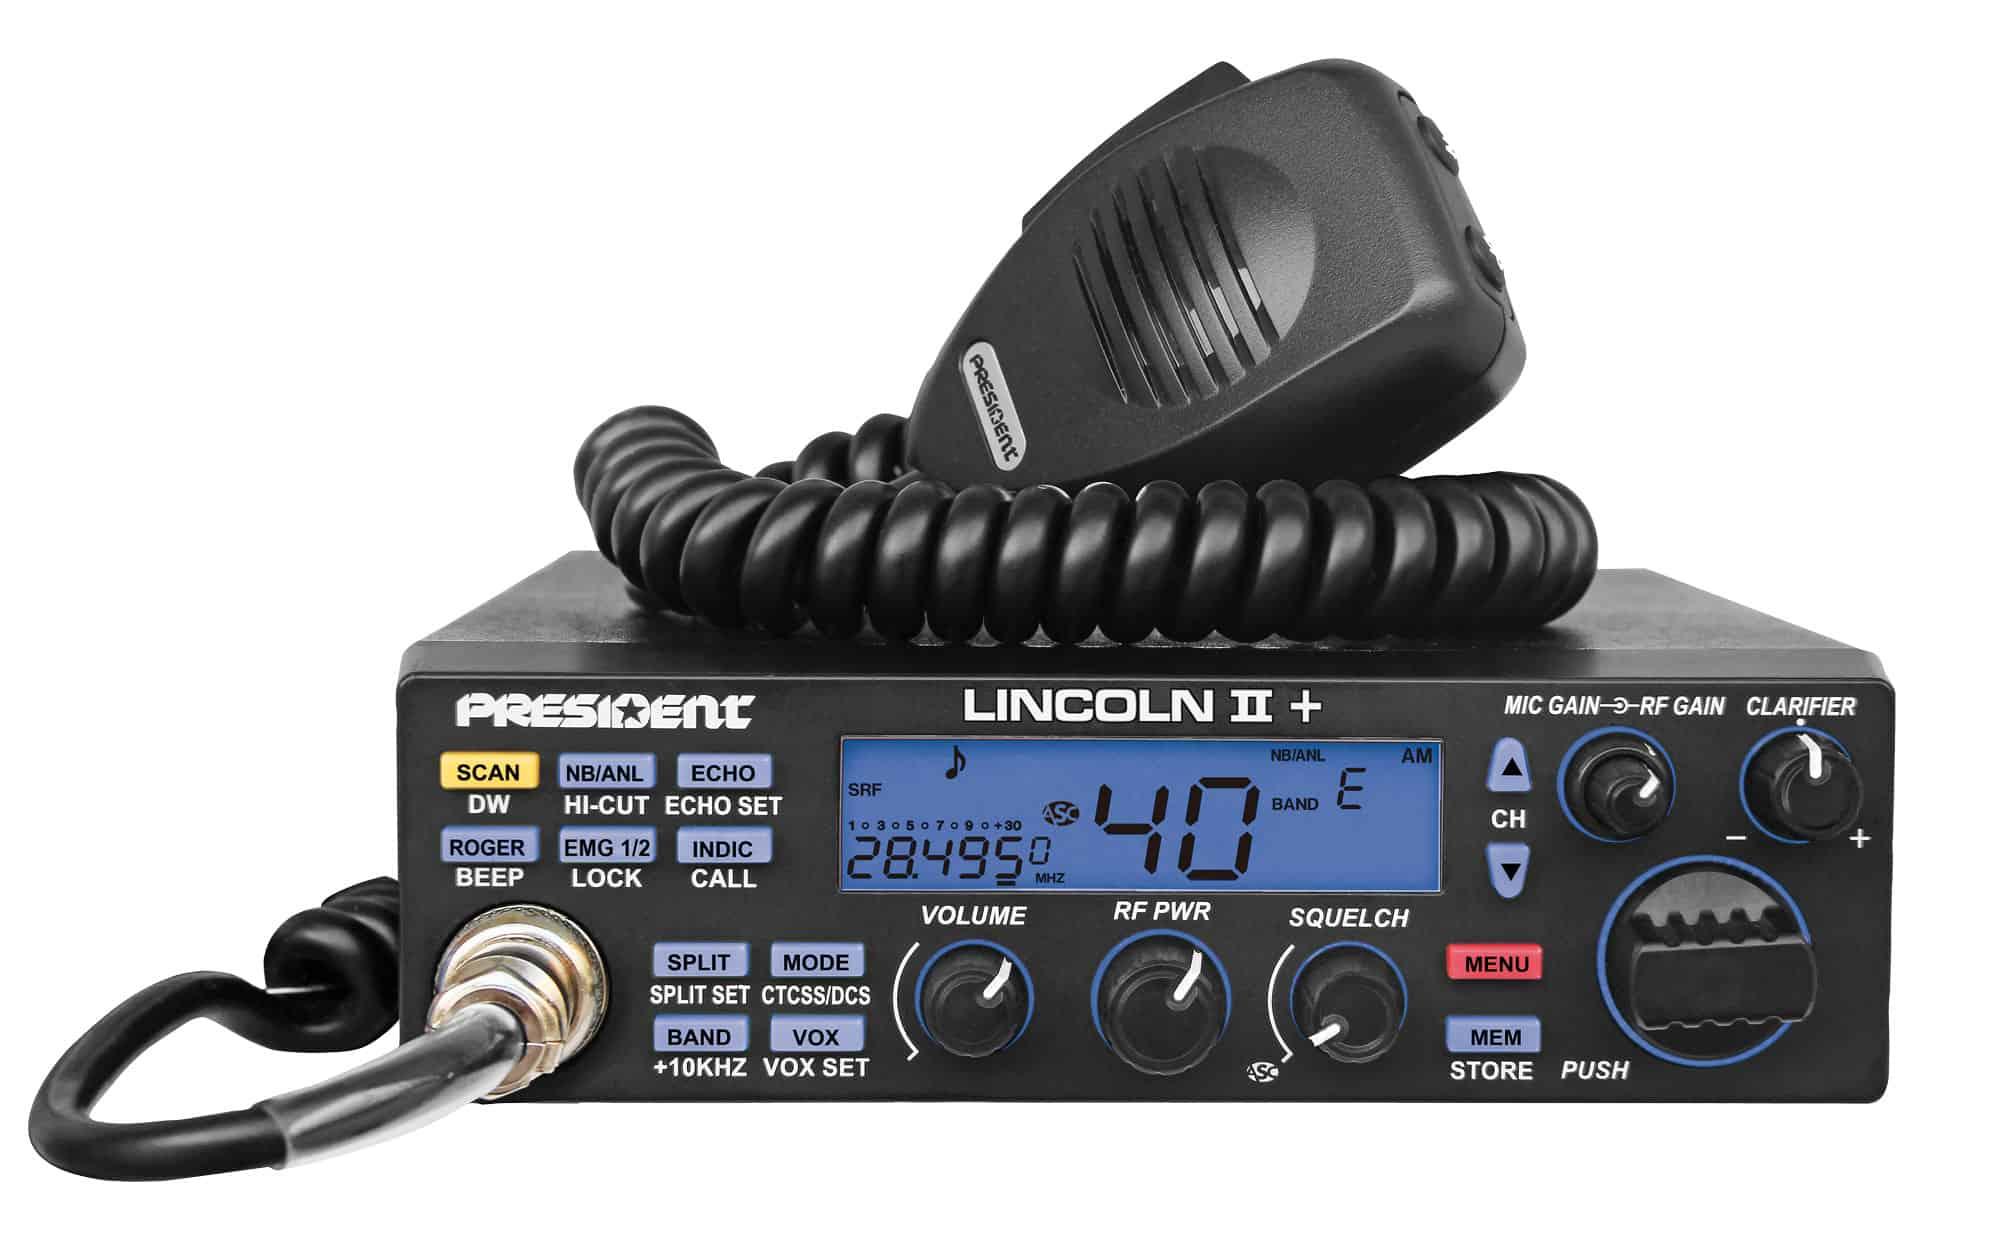 LINCOLNII+ - President 10 Meter / 12 Meter Transceiver Amateur Ham Radio